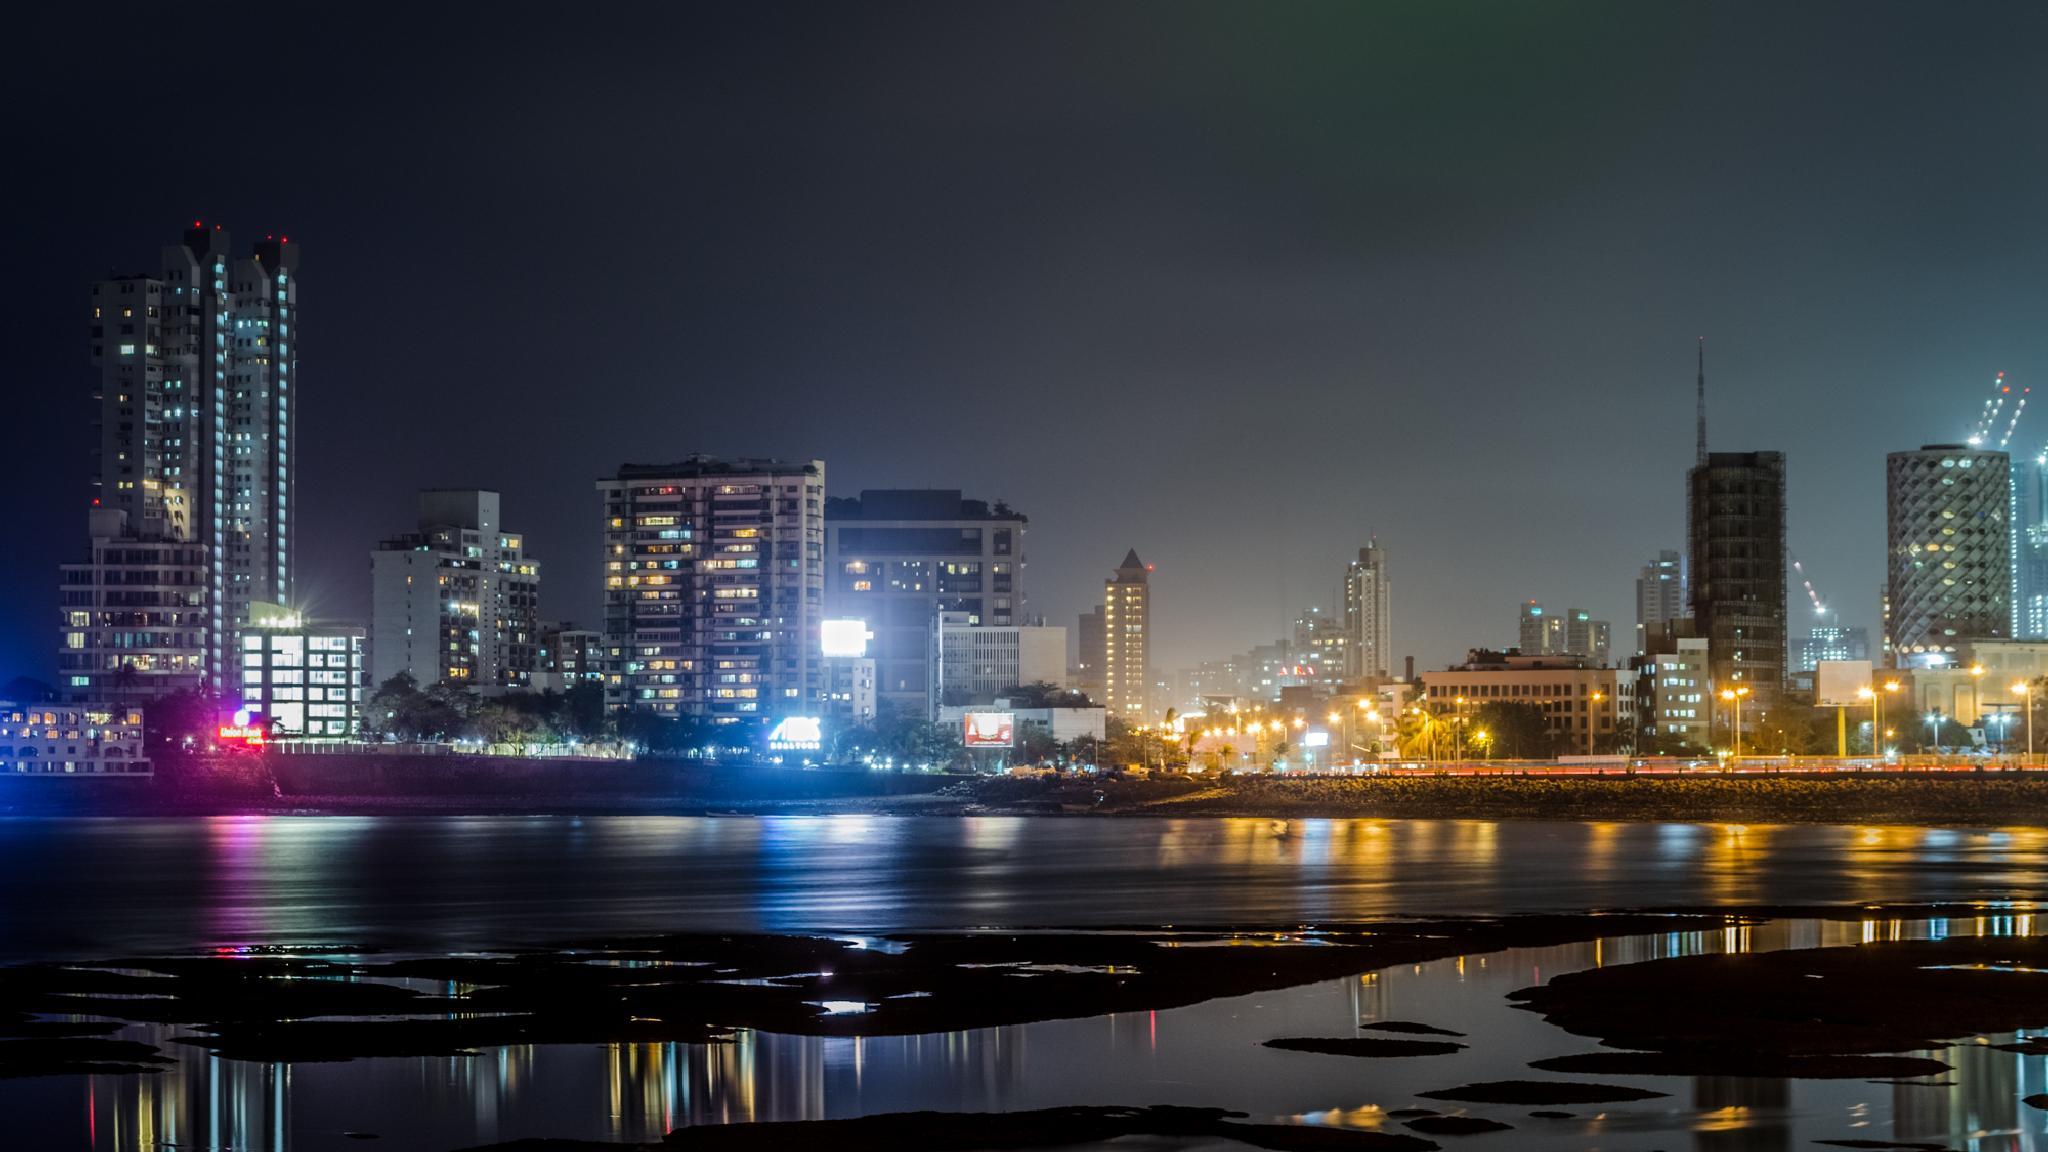 Mumbai Skyline at Haji Ali by Munindro